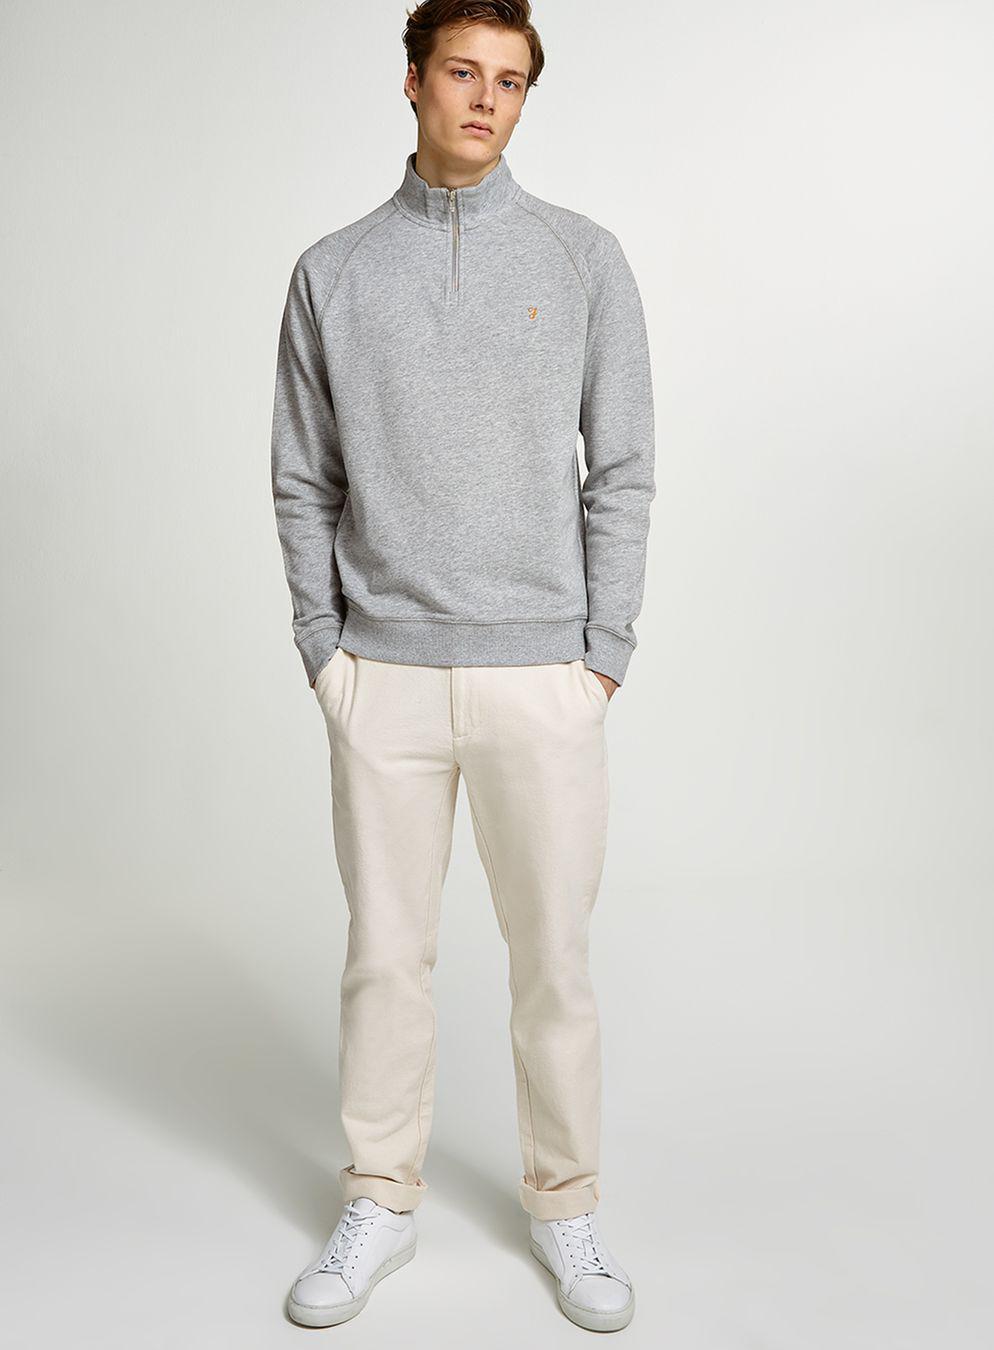 TOPMAN Cotton Farah Grey 'kyle' Track Top in Grey for Men